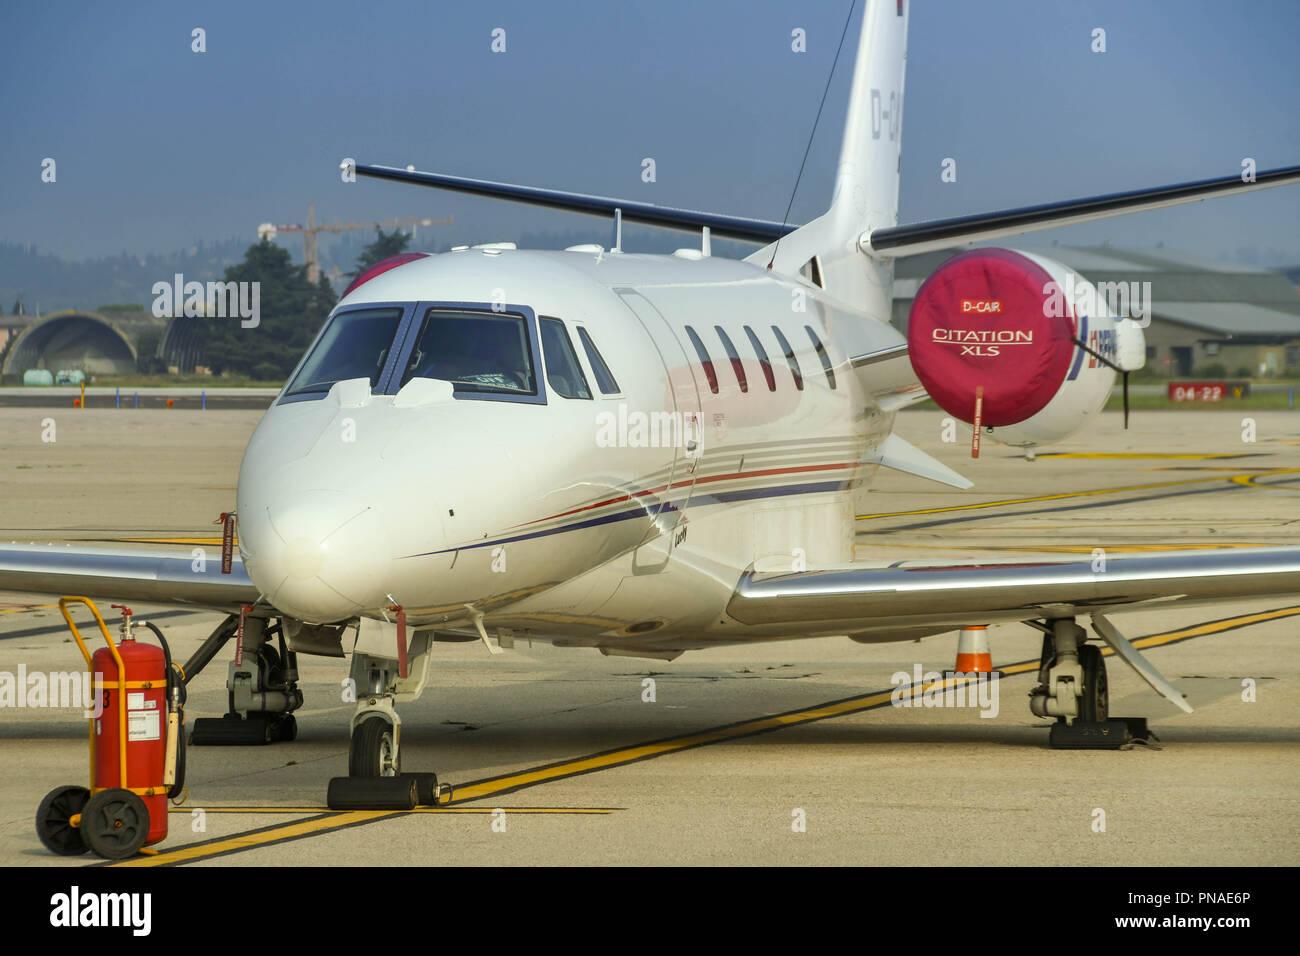 Cessna Citation XLS private executive jet at Verona airport. - Stock Image